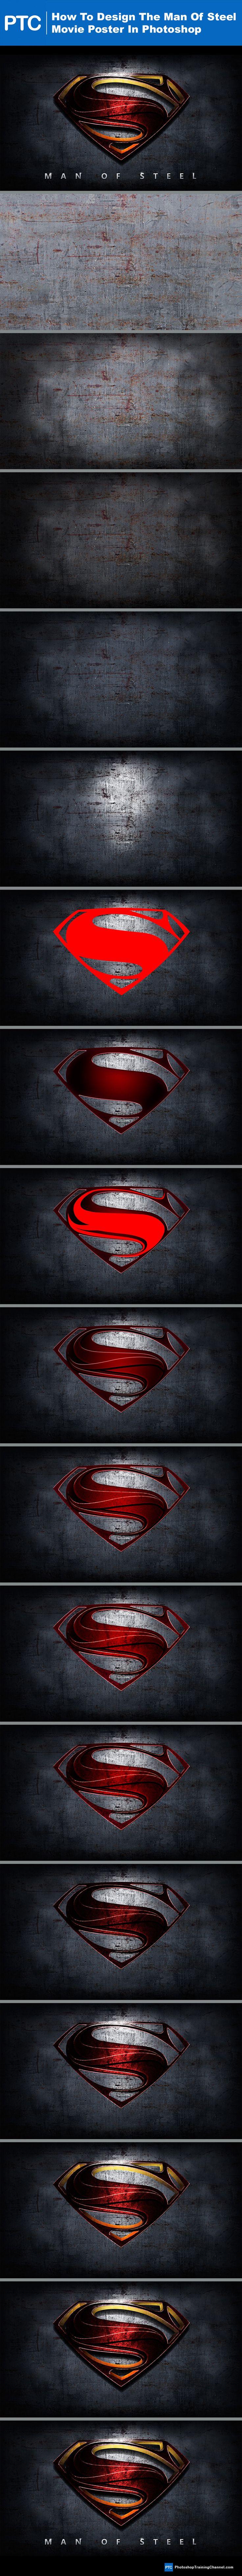 Design The Superman Man Of Steel Movie Poster In Photoshop. #Photoshop #Tutorial #Graphic #Design http://photoshoptrainingchaneel.com